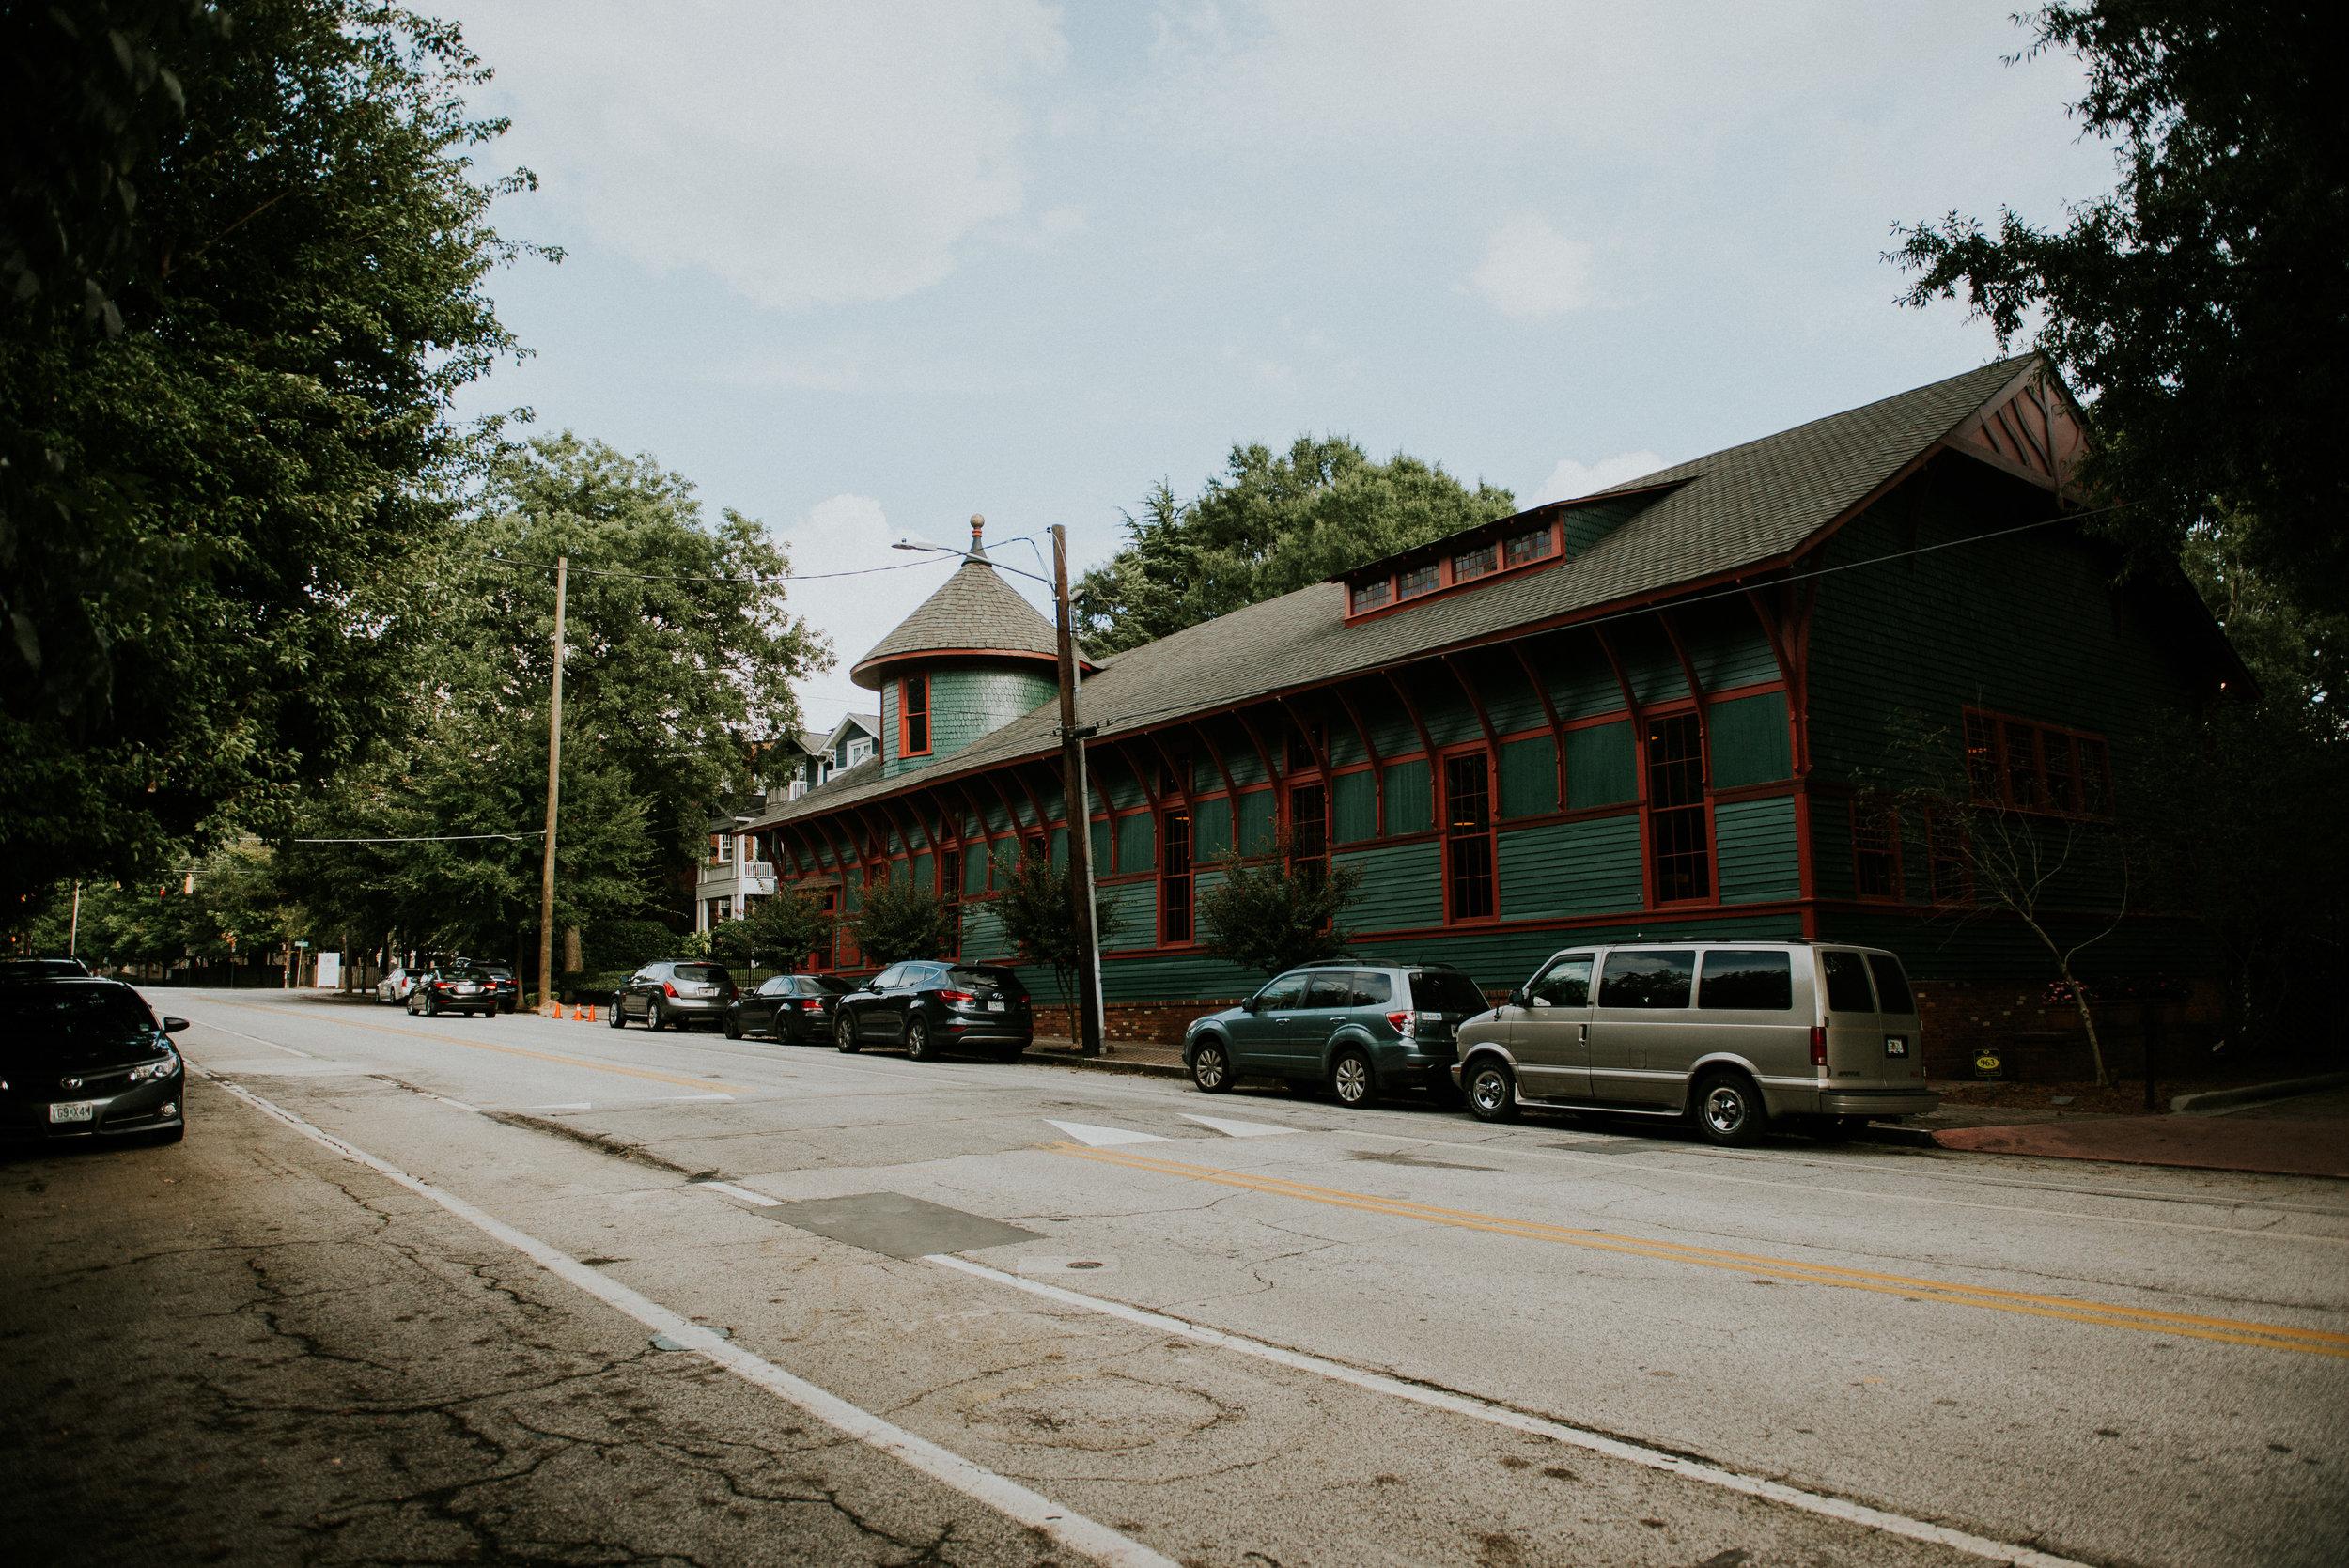 The Trolley Barn in Atlanta, GA